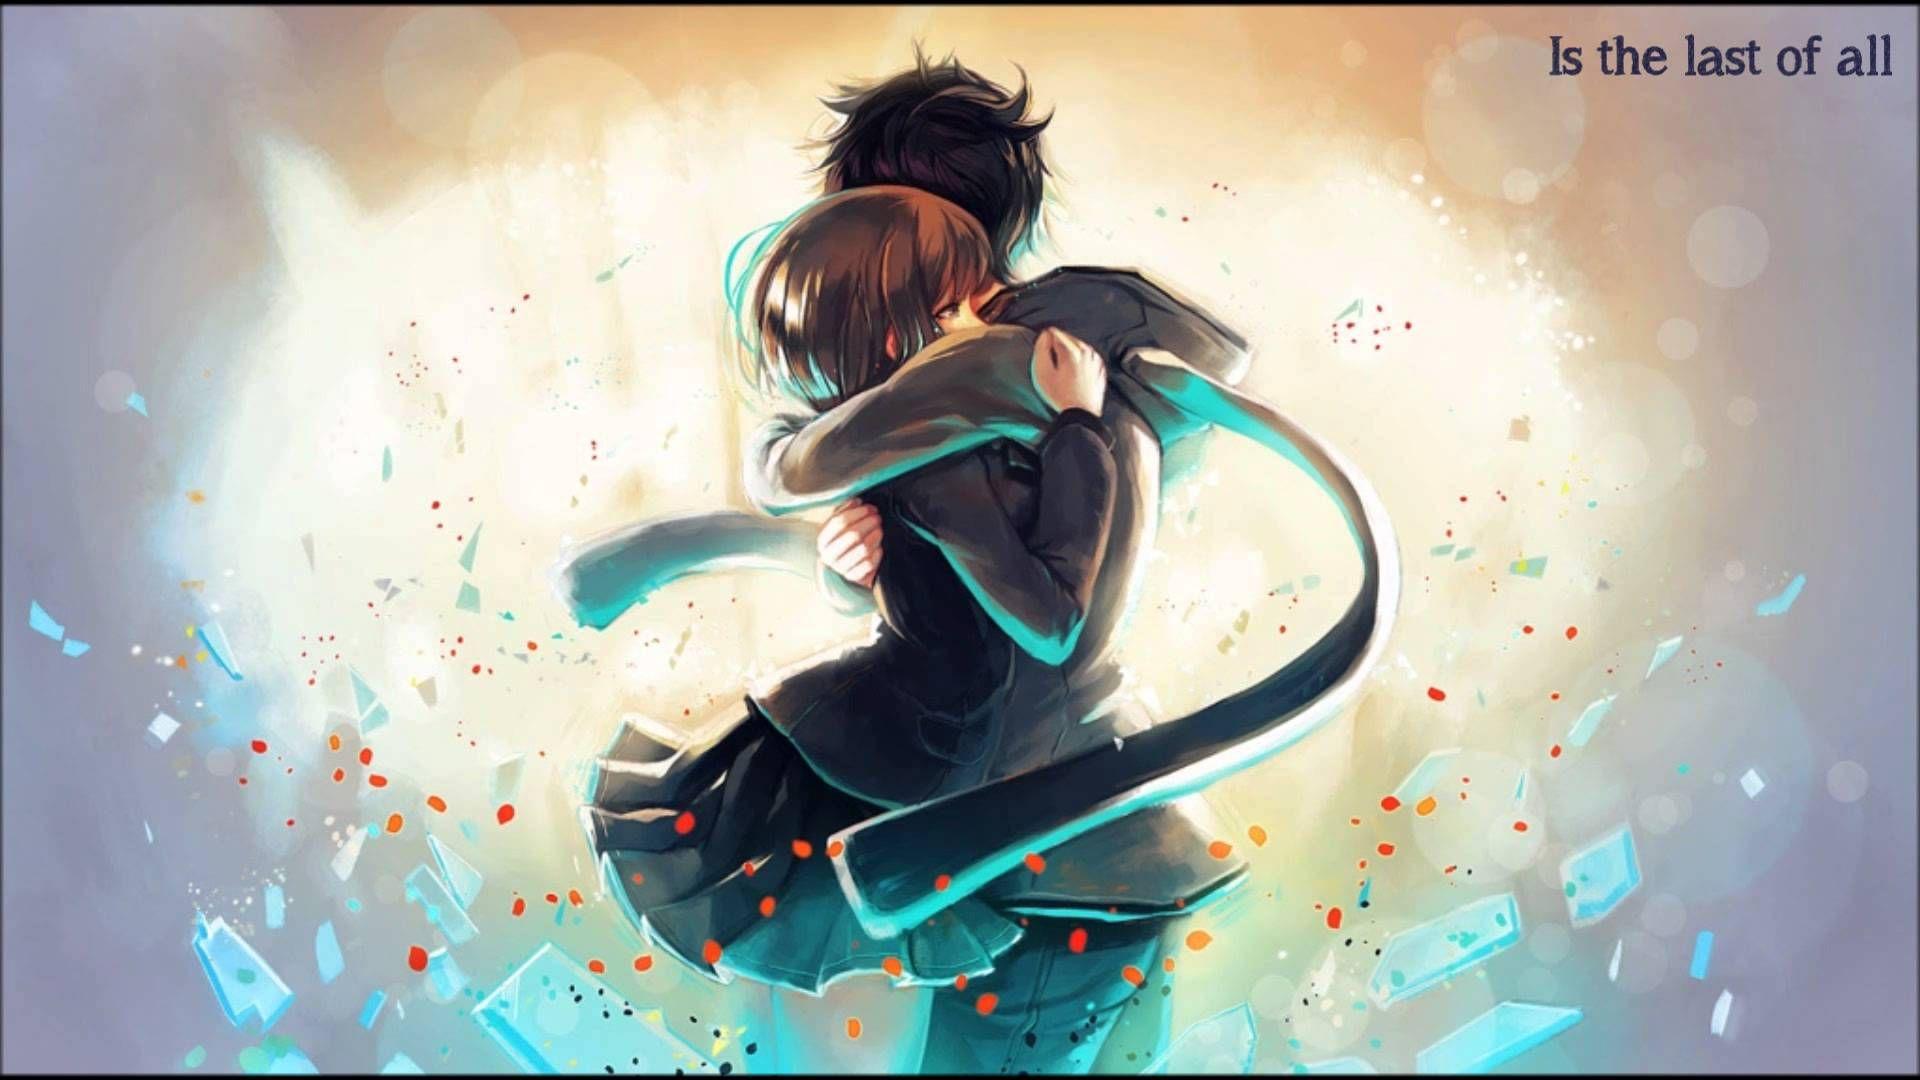 Nightcore Demons Hd Anime Wallpapers Romantic Anime Anime Hug